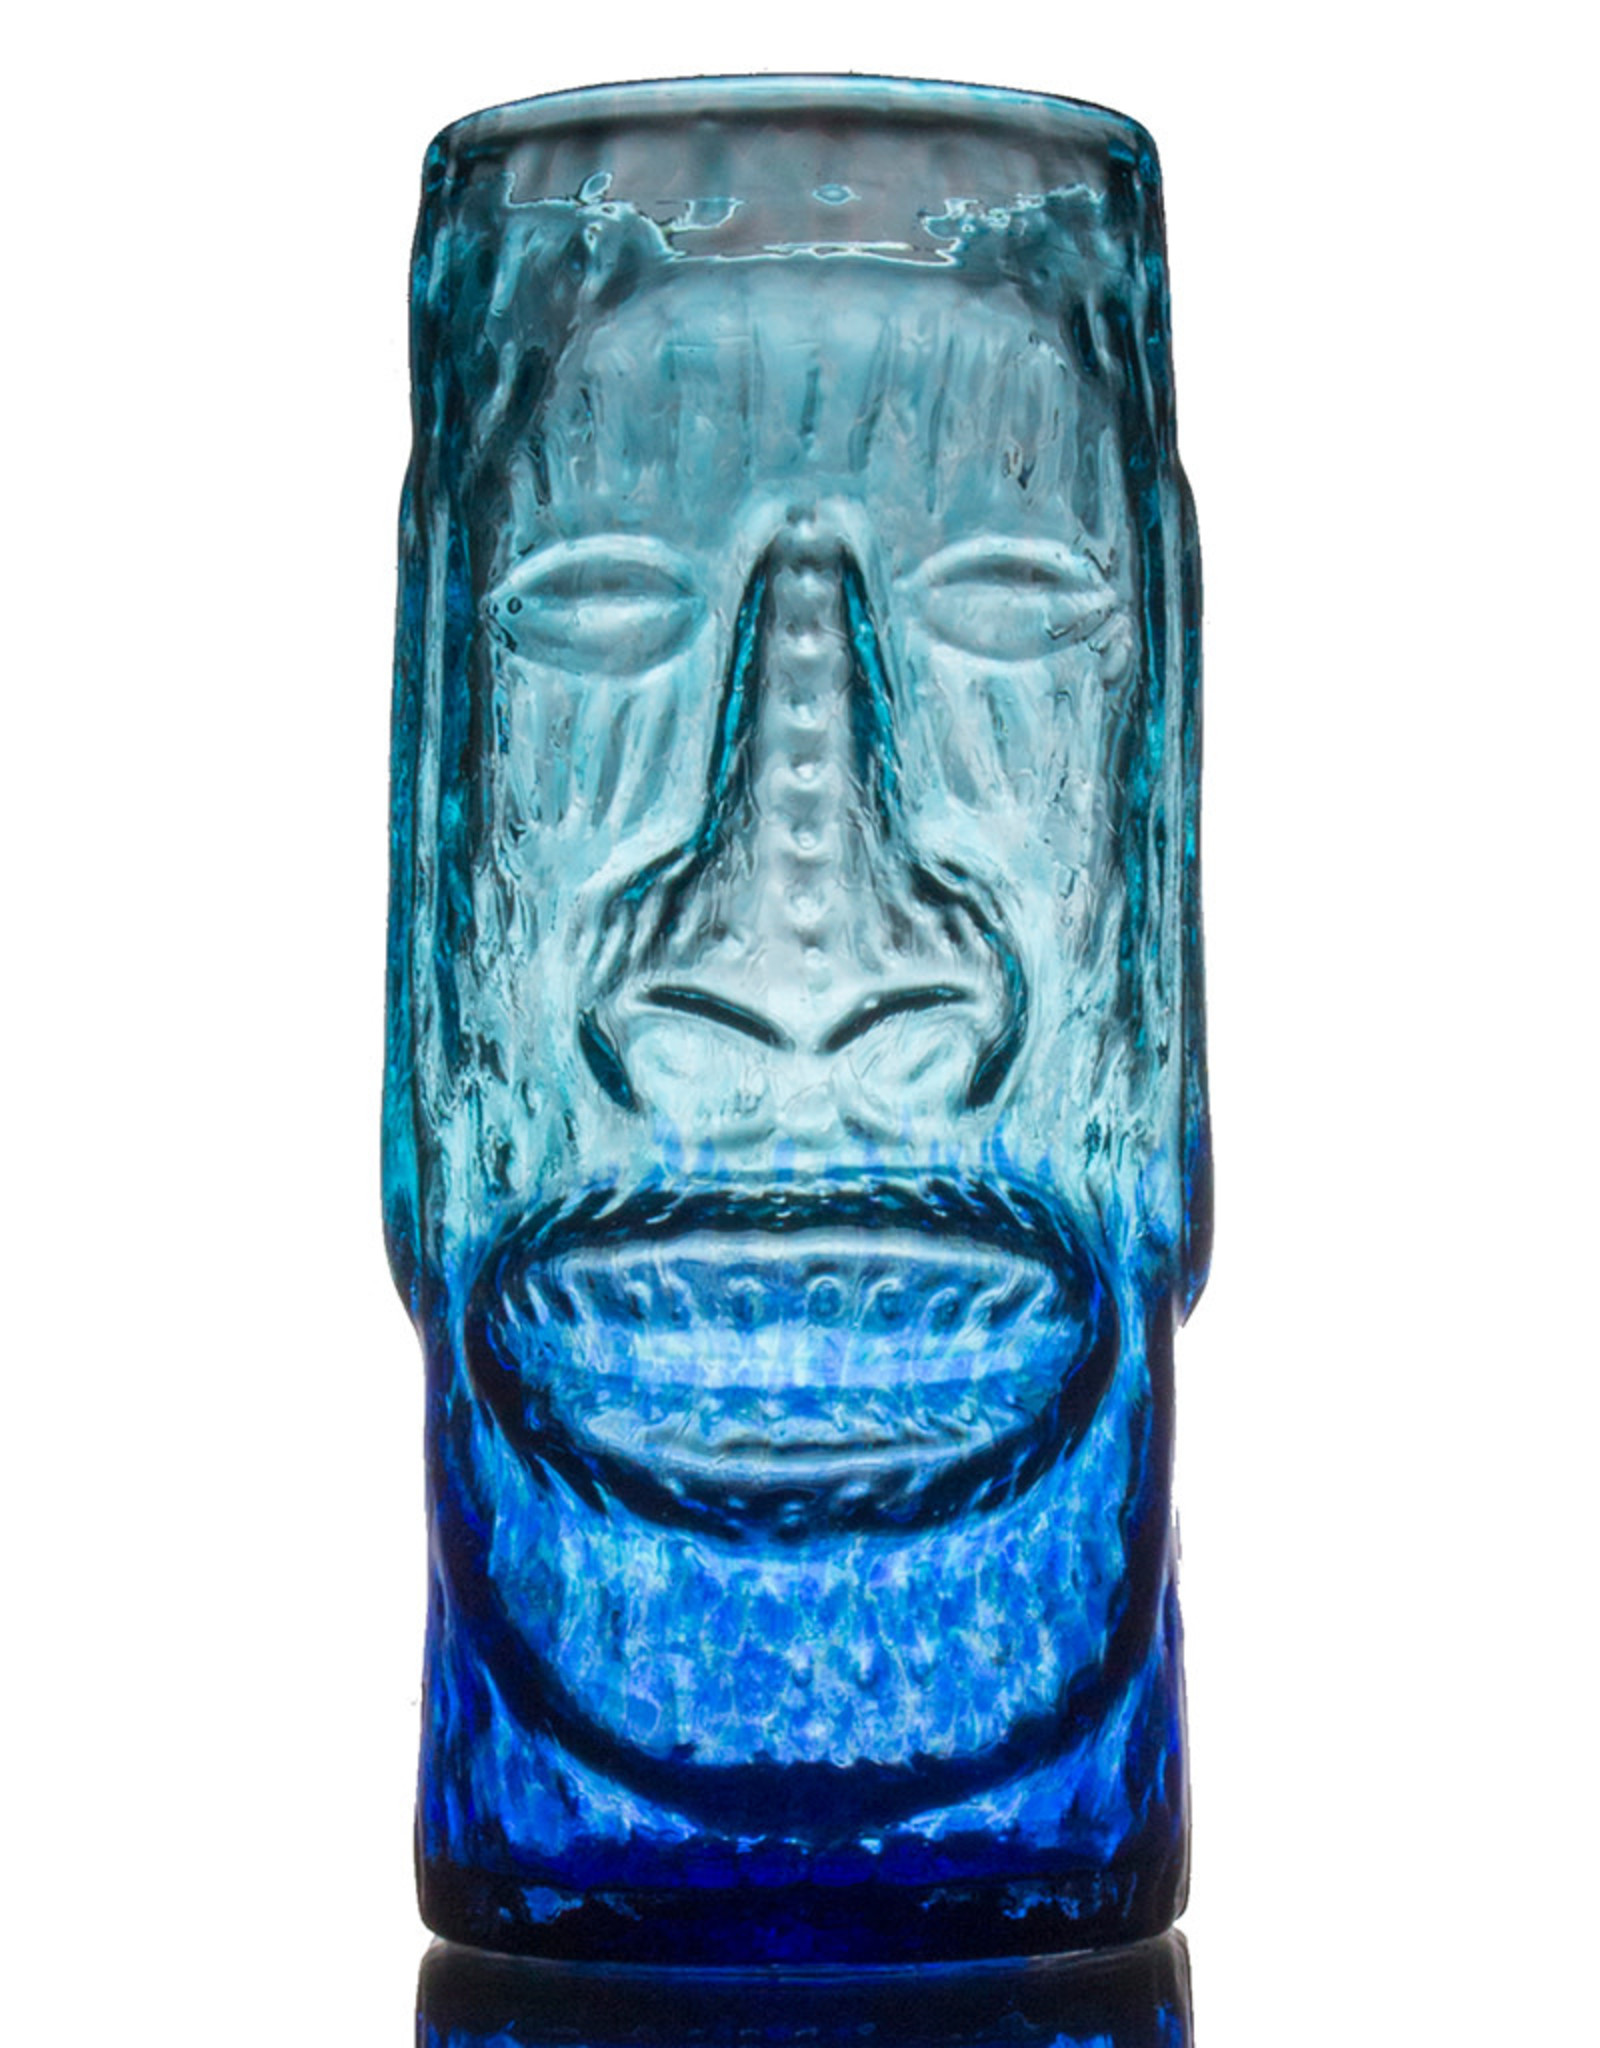 IANNAZZI GLASS DESIGN MOAI BLUE LAGOON GLASS TIKI MUG